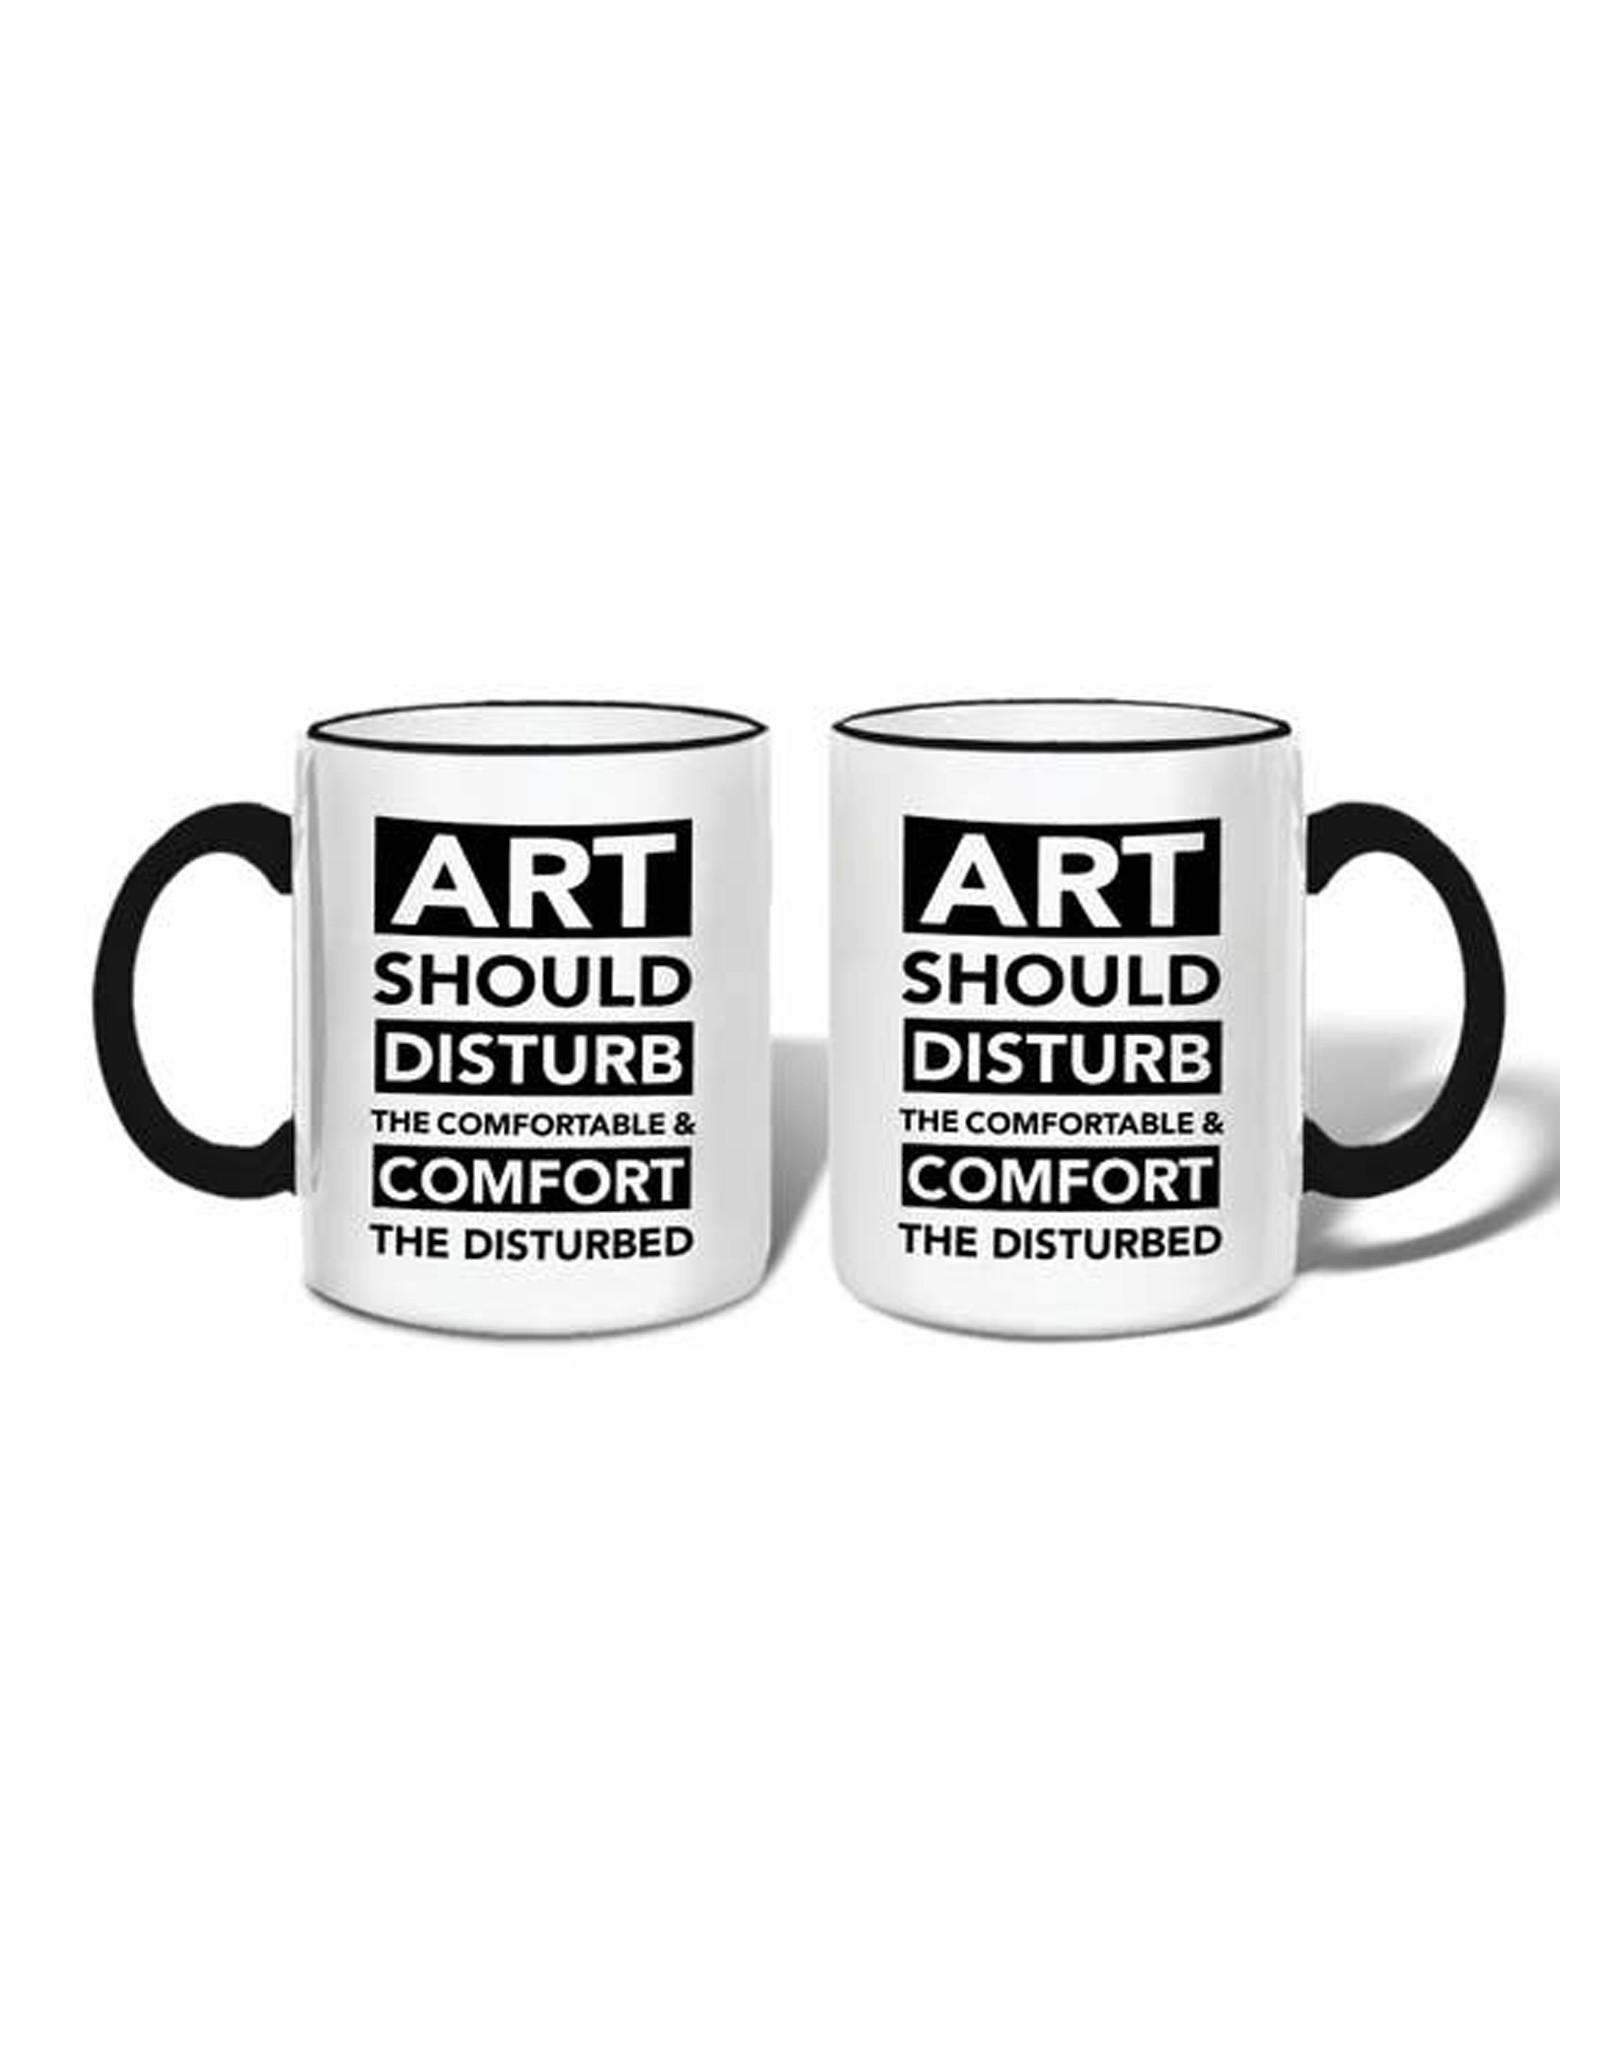 Art Should Disturb Mug